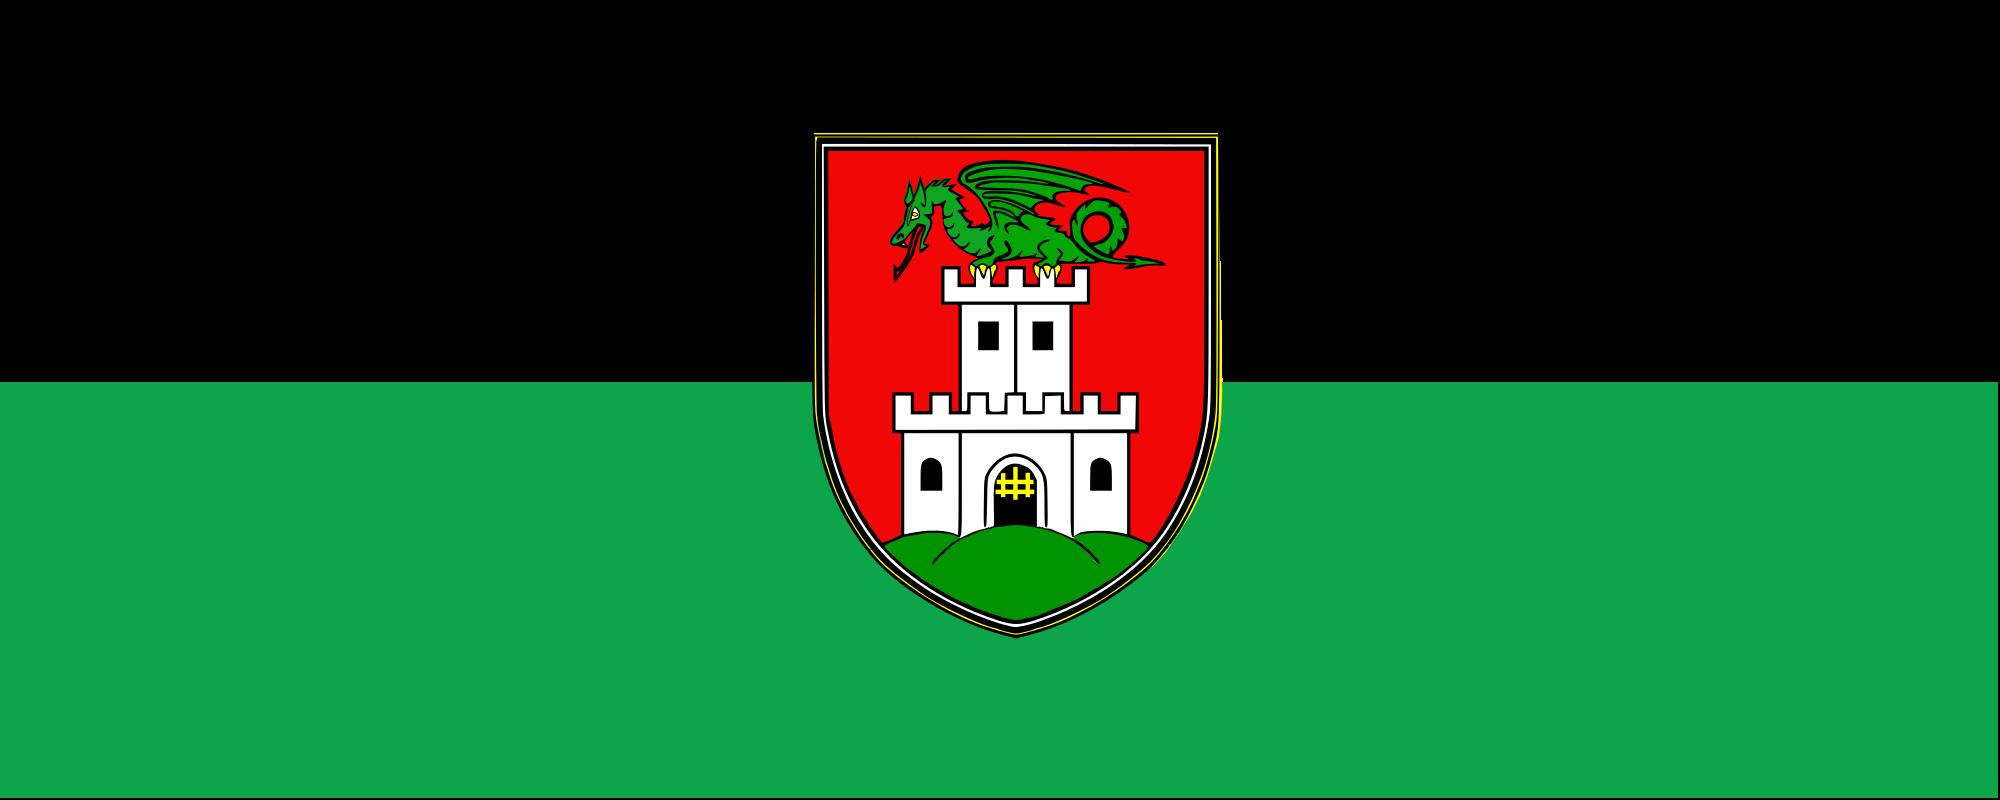 Ljubliana